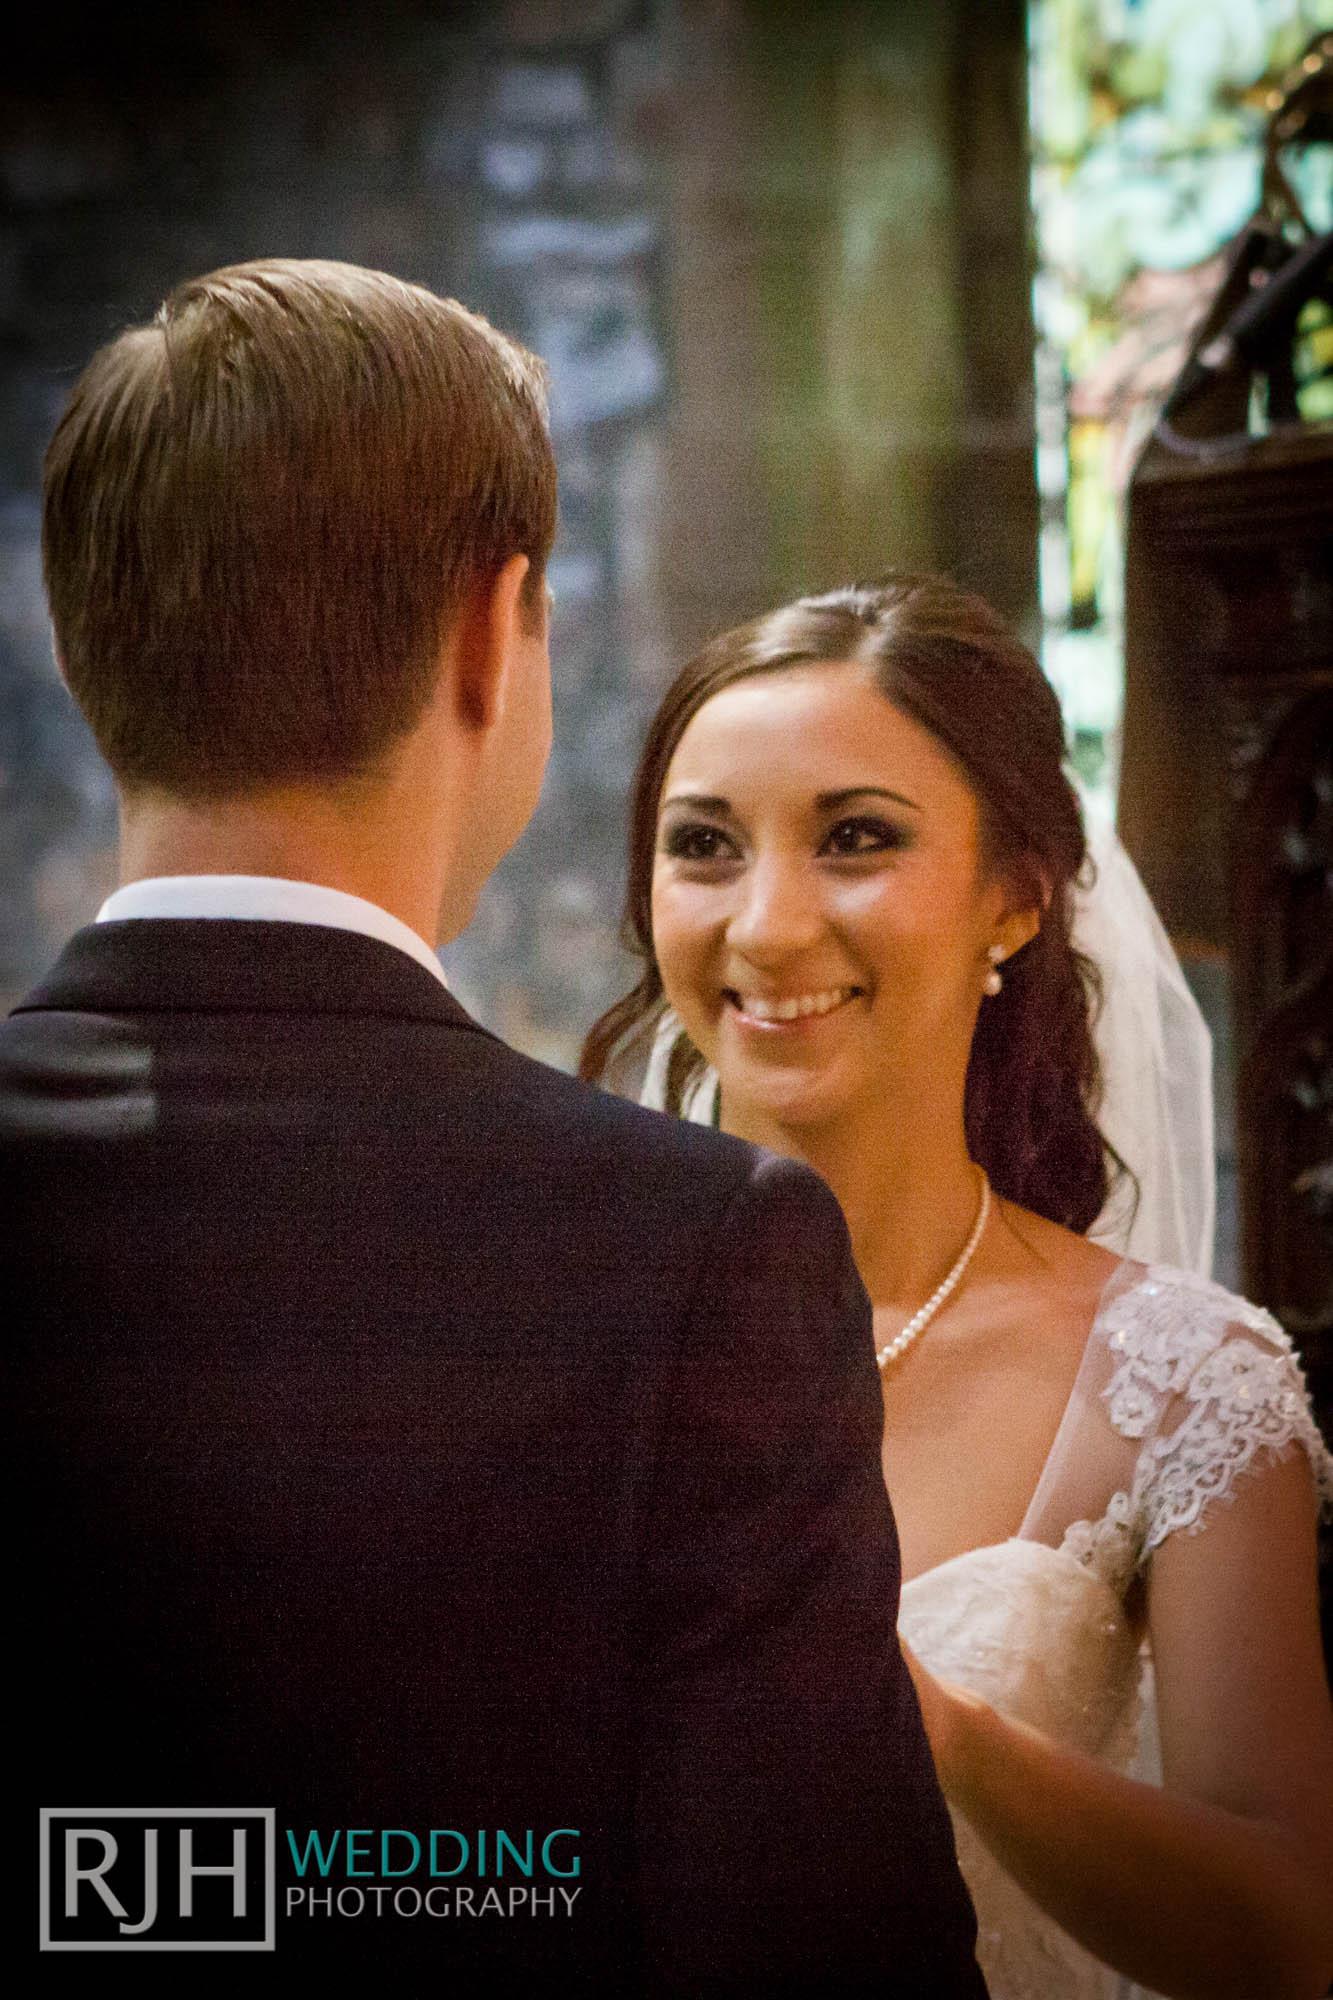 RJH Wedding Photography_Tankersley Manor Wedding_19.jpg